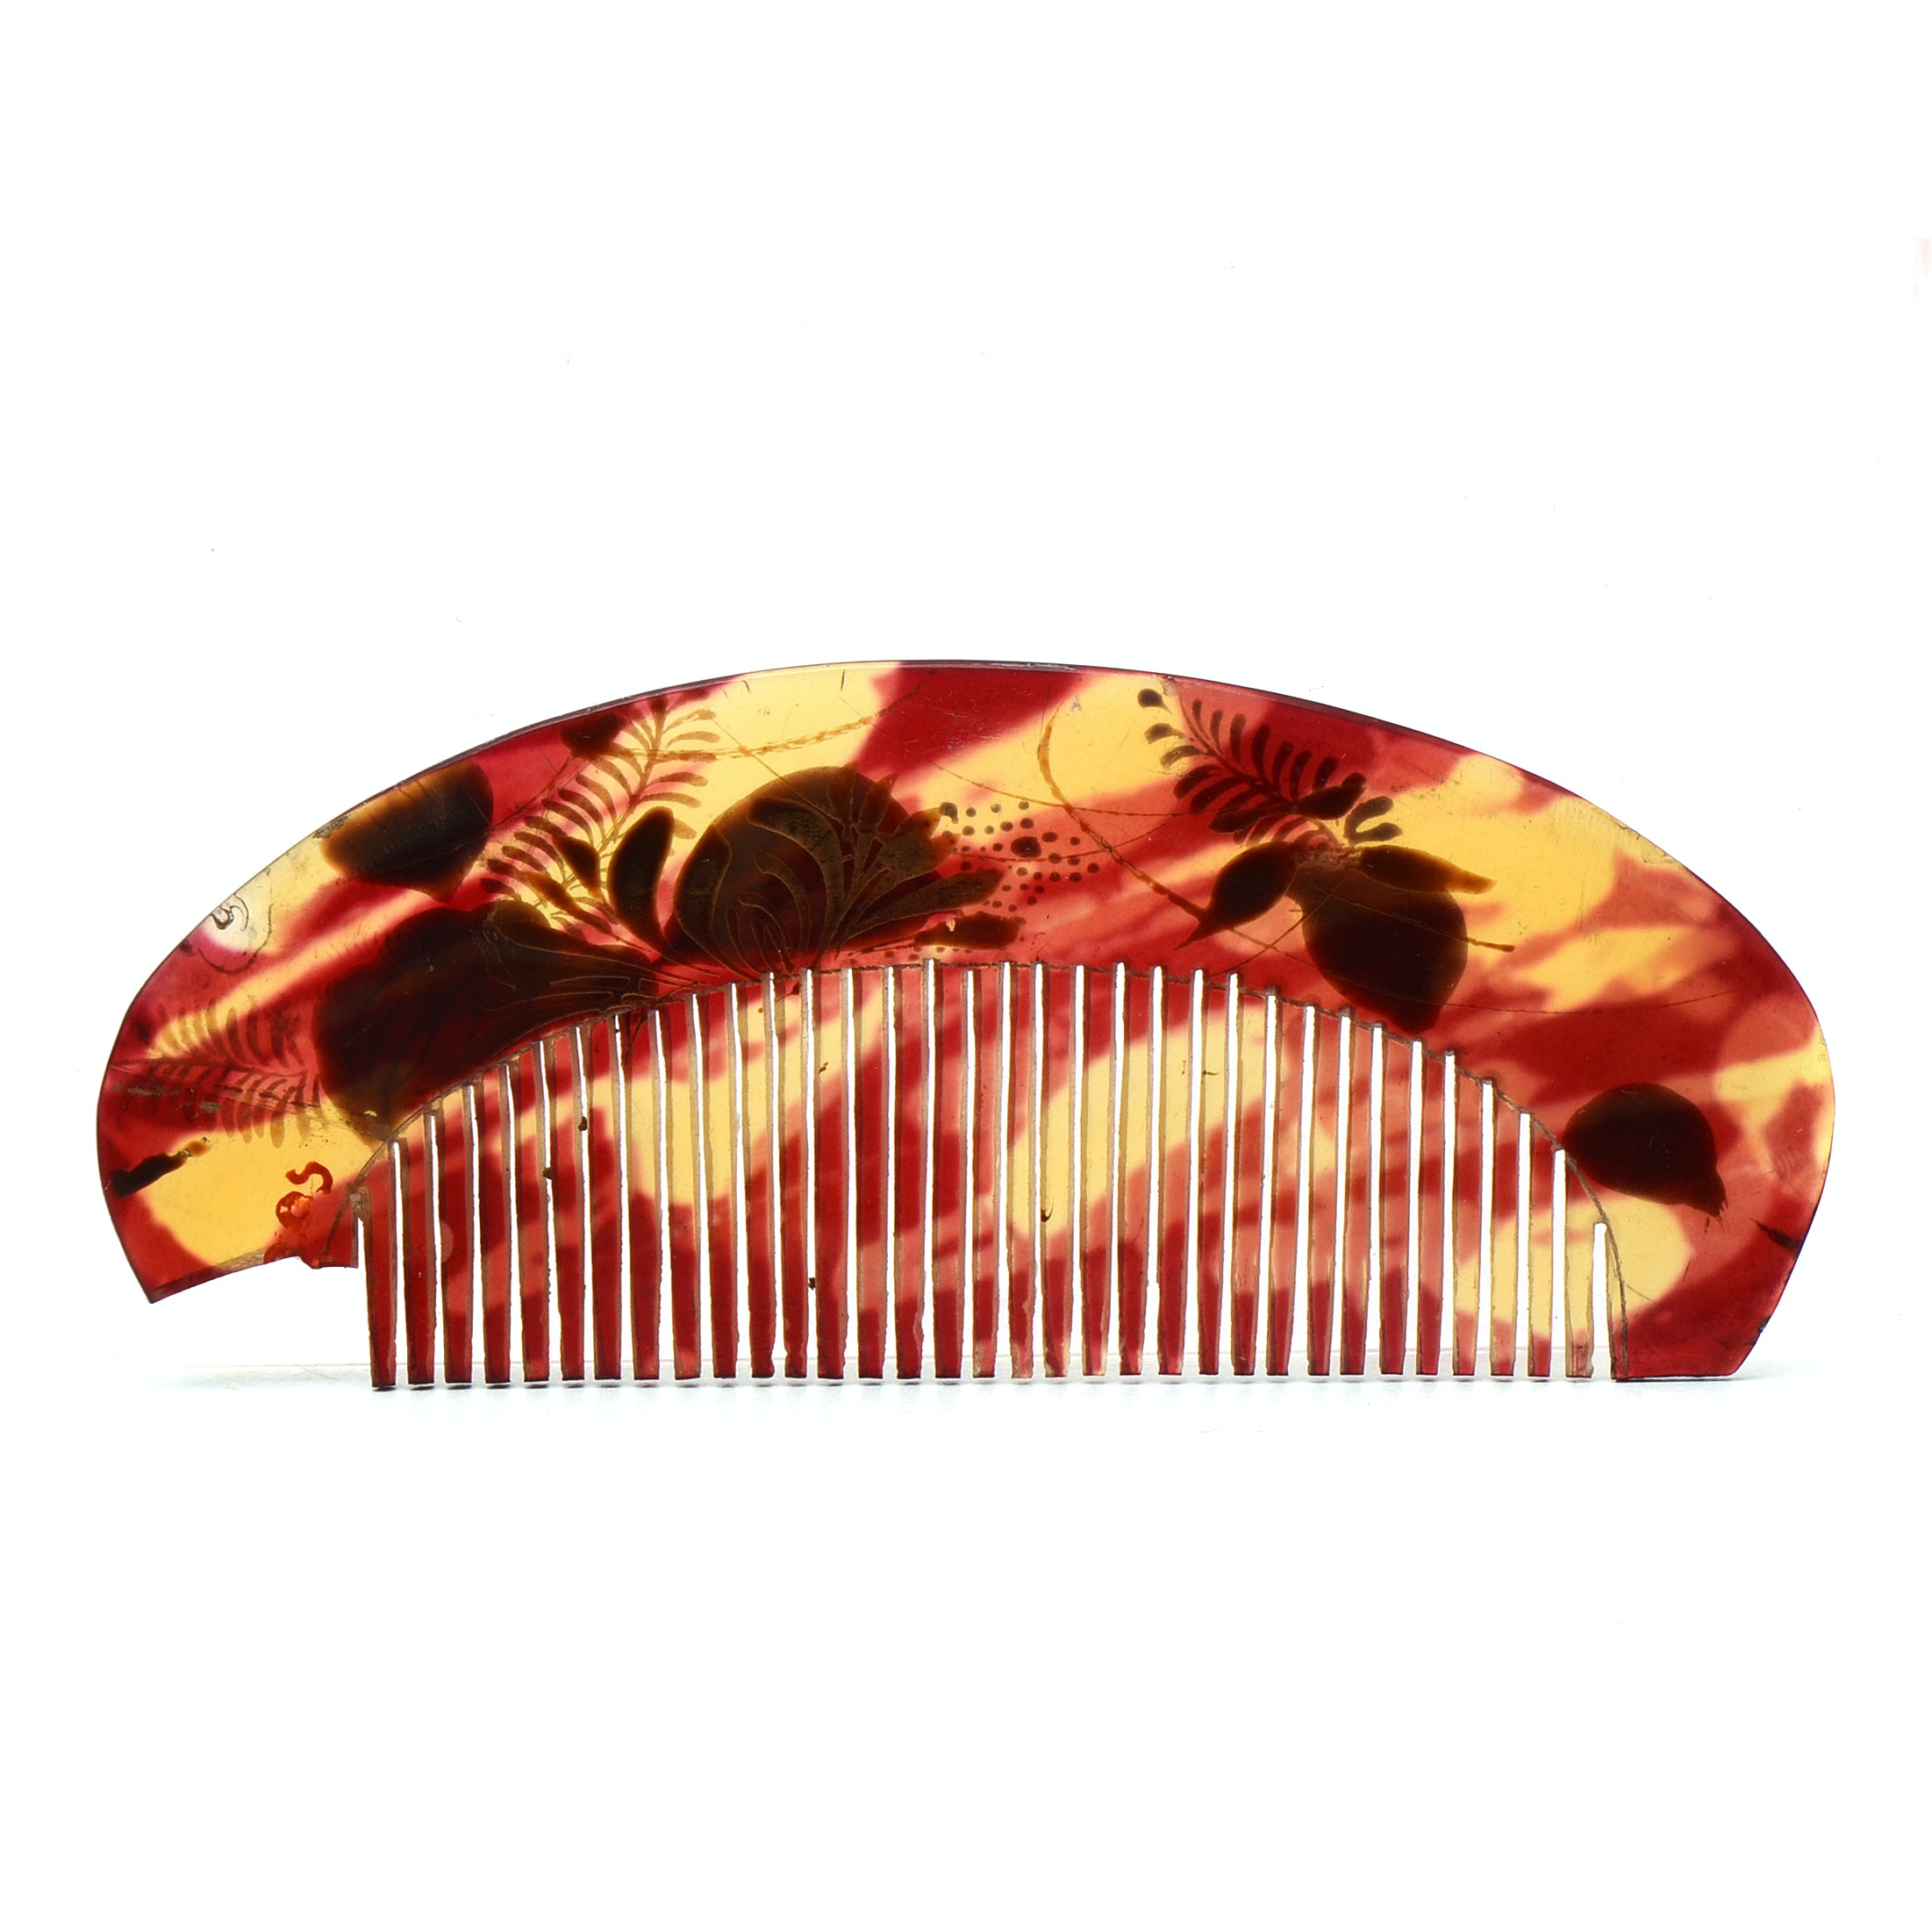 Meiji Period Tortoiseshell Comb